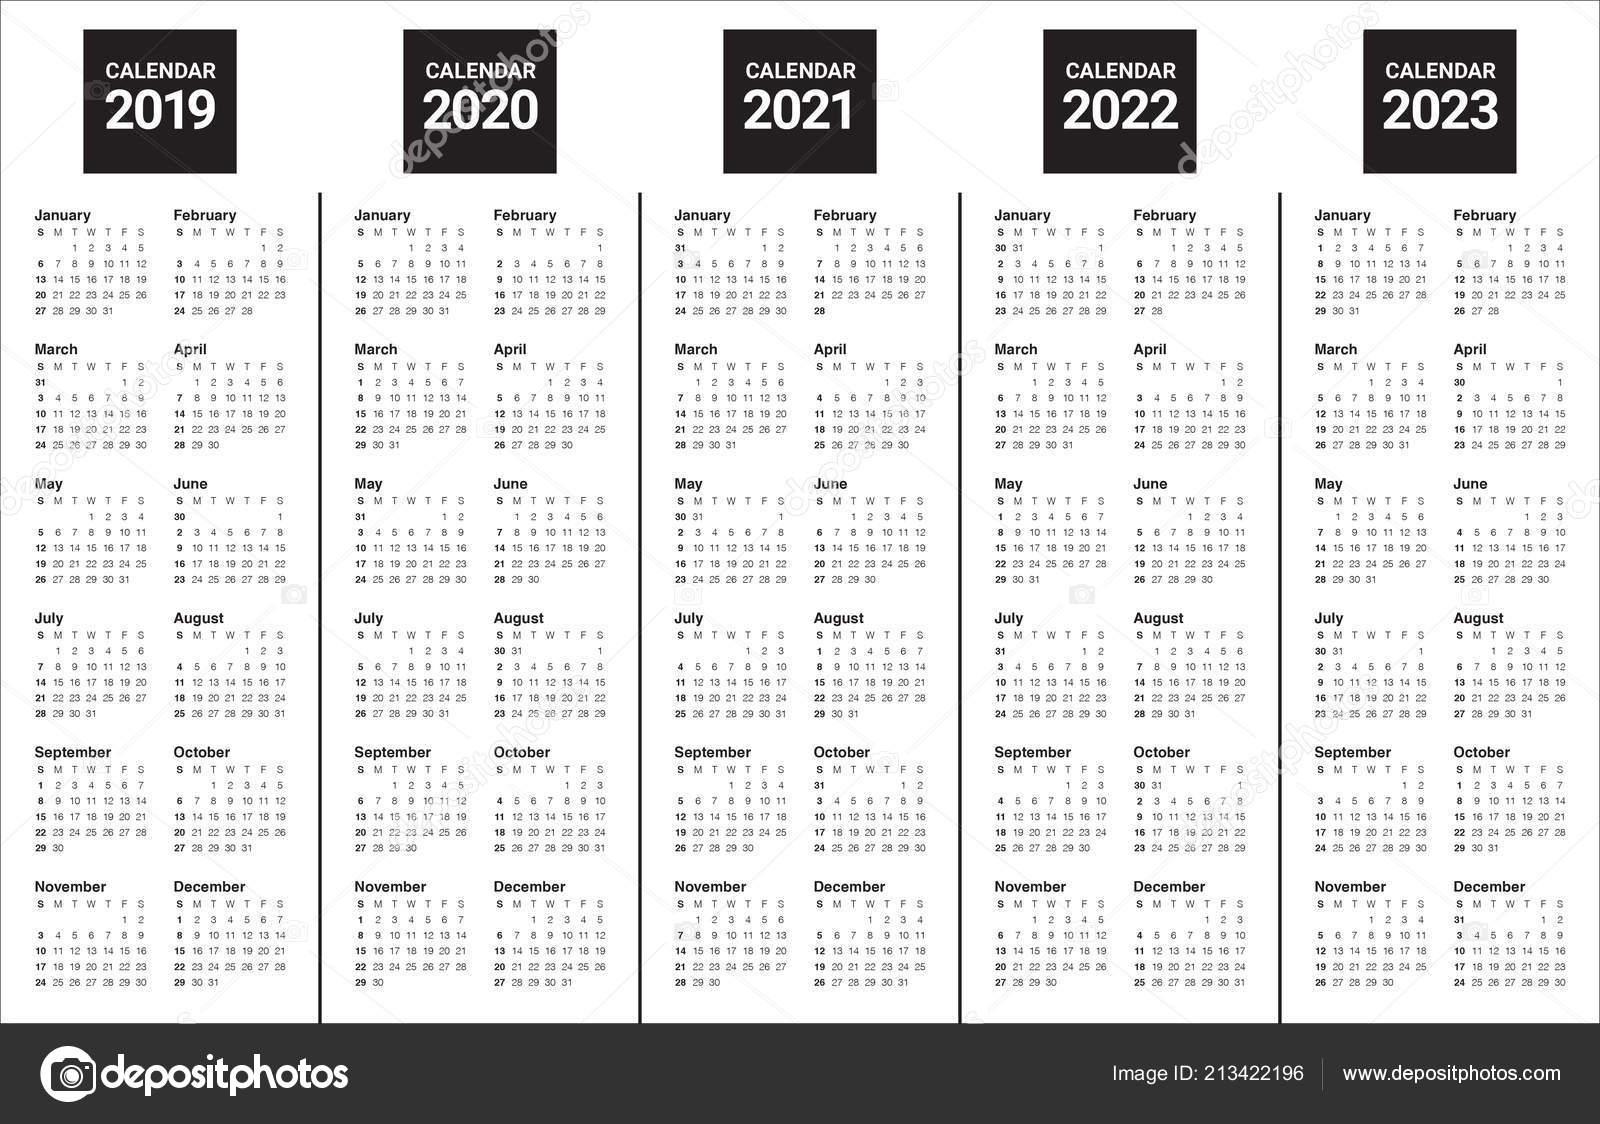 Year 2019 2020 2021 2022 2023 Calendar Vector Design with Calendar Years 2019 2020 2021 2022 2023